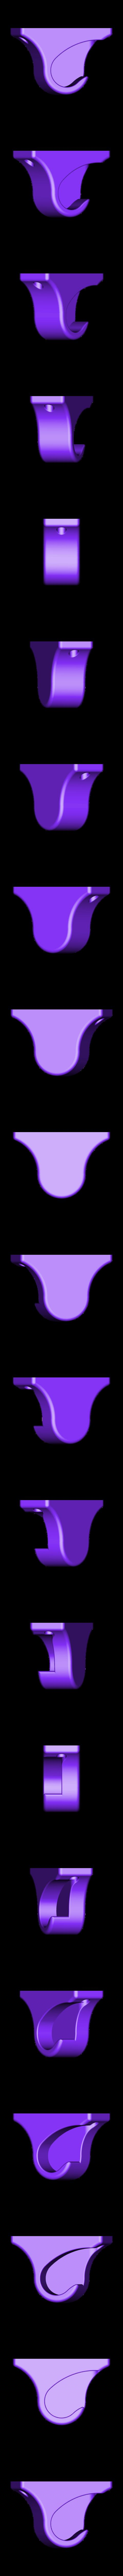 End_cap_small_left_open.STL Download free STL file Hook & Hanger System • 3D printing object, Festus440